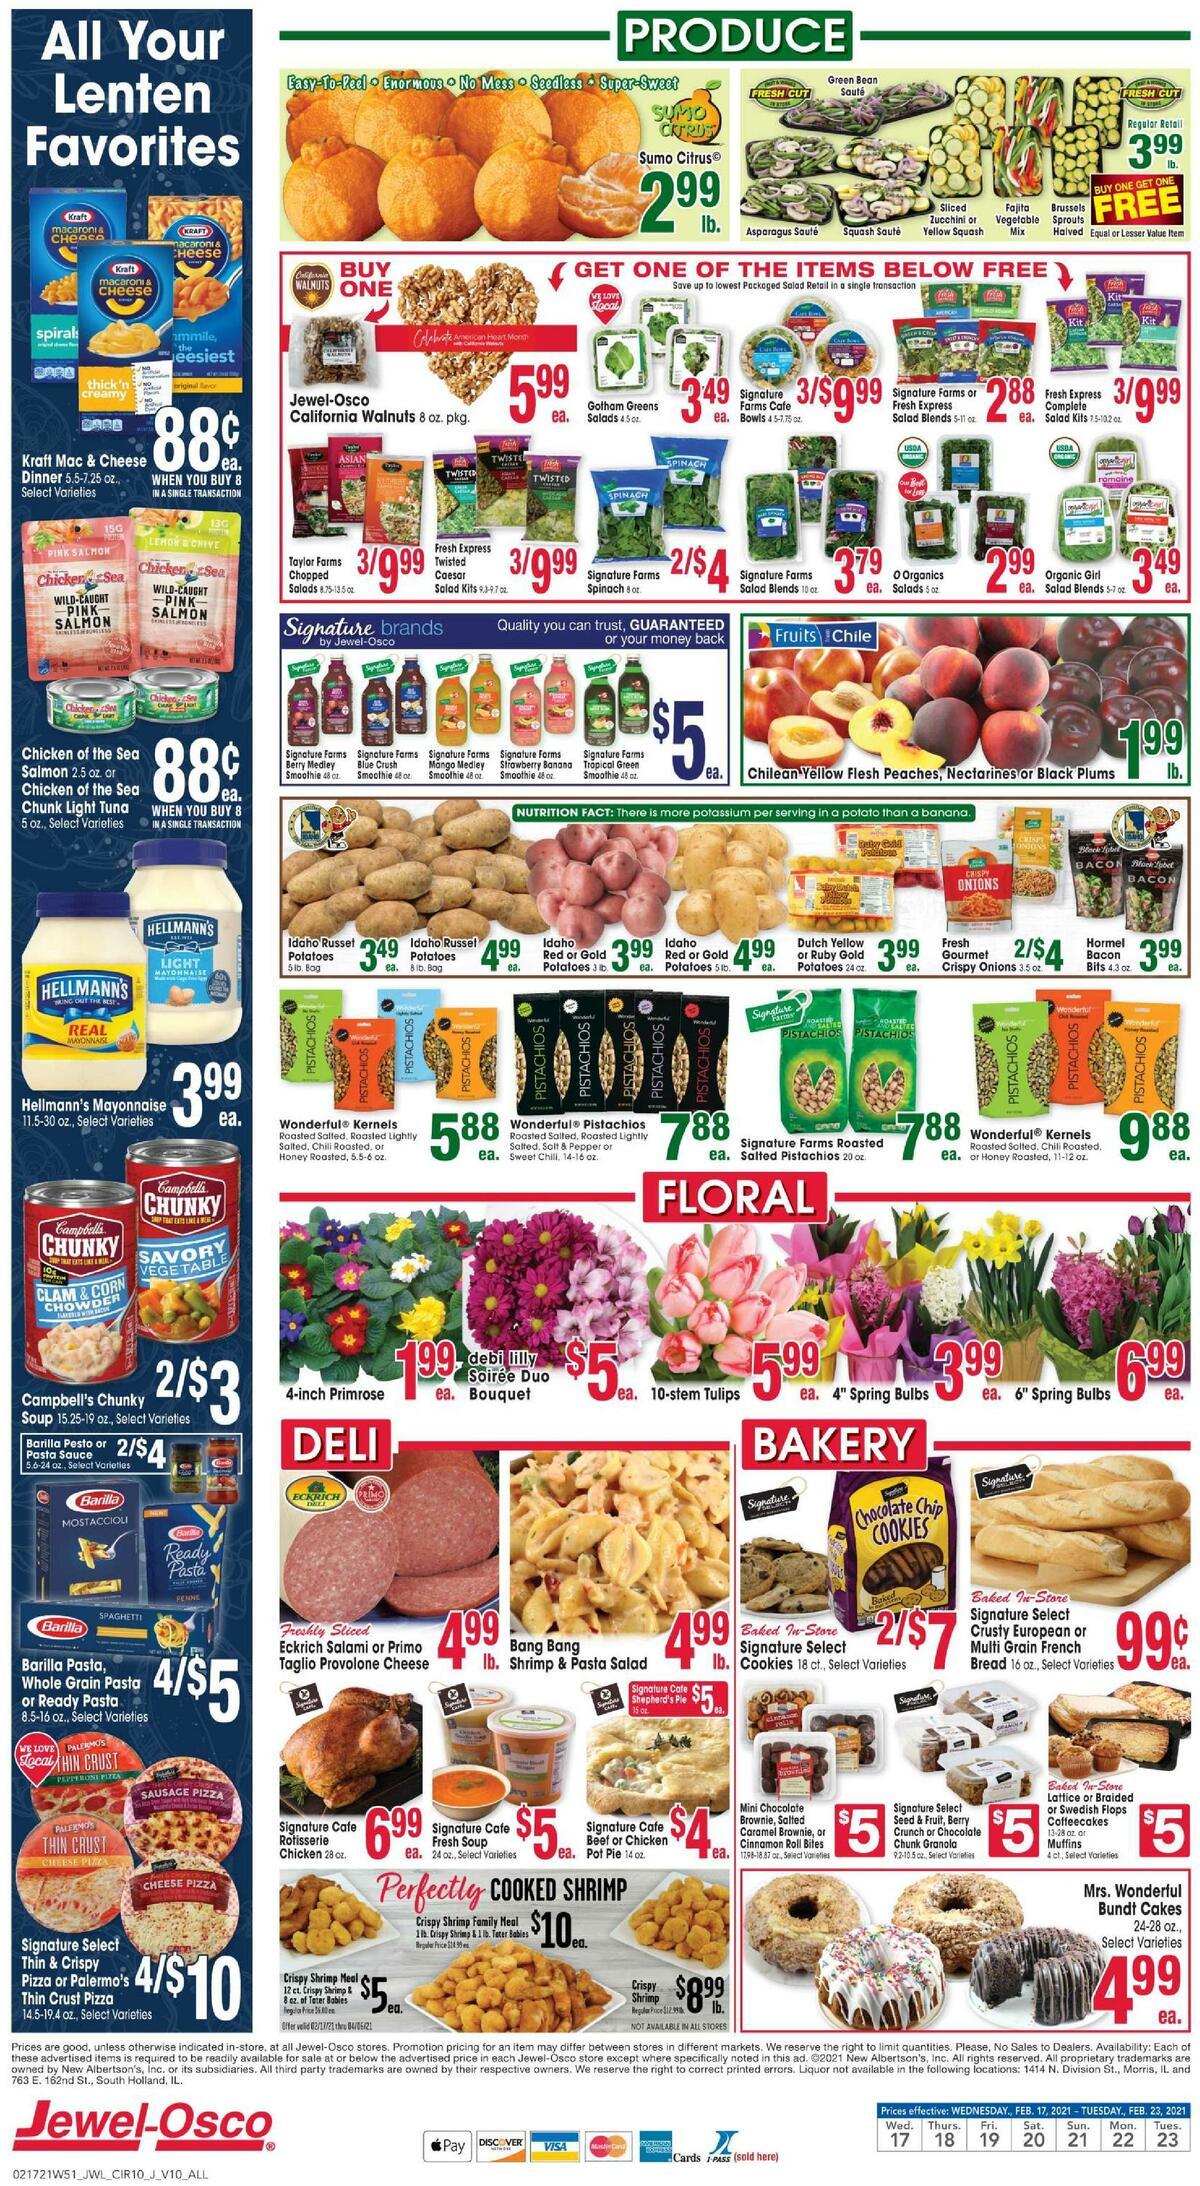 Jewel Osco Weekly Ad from February 17